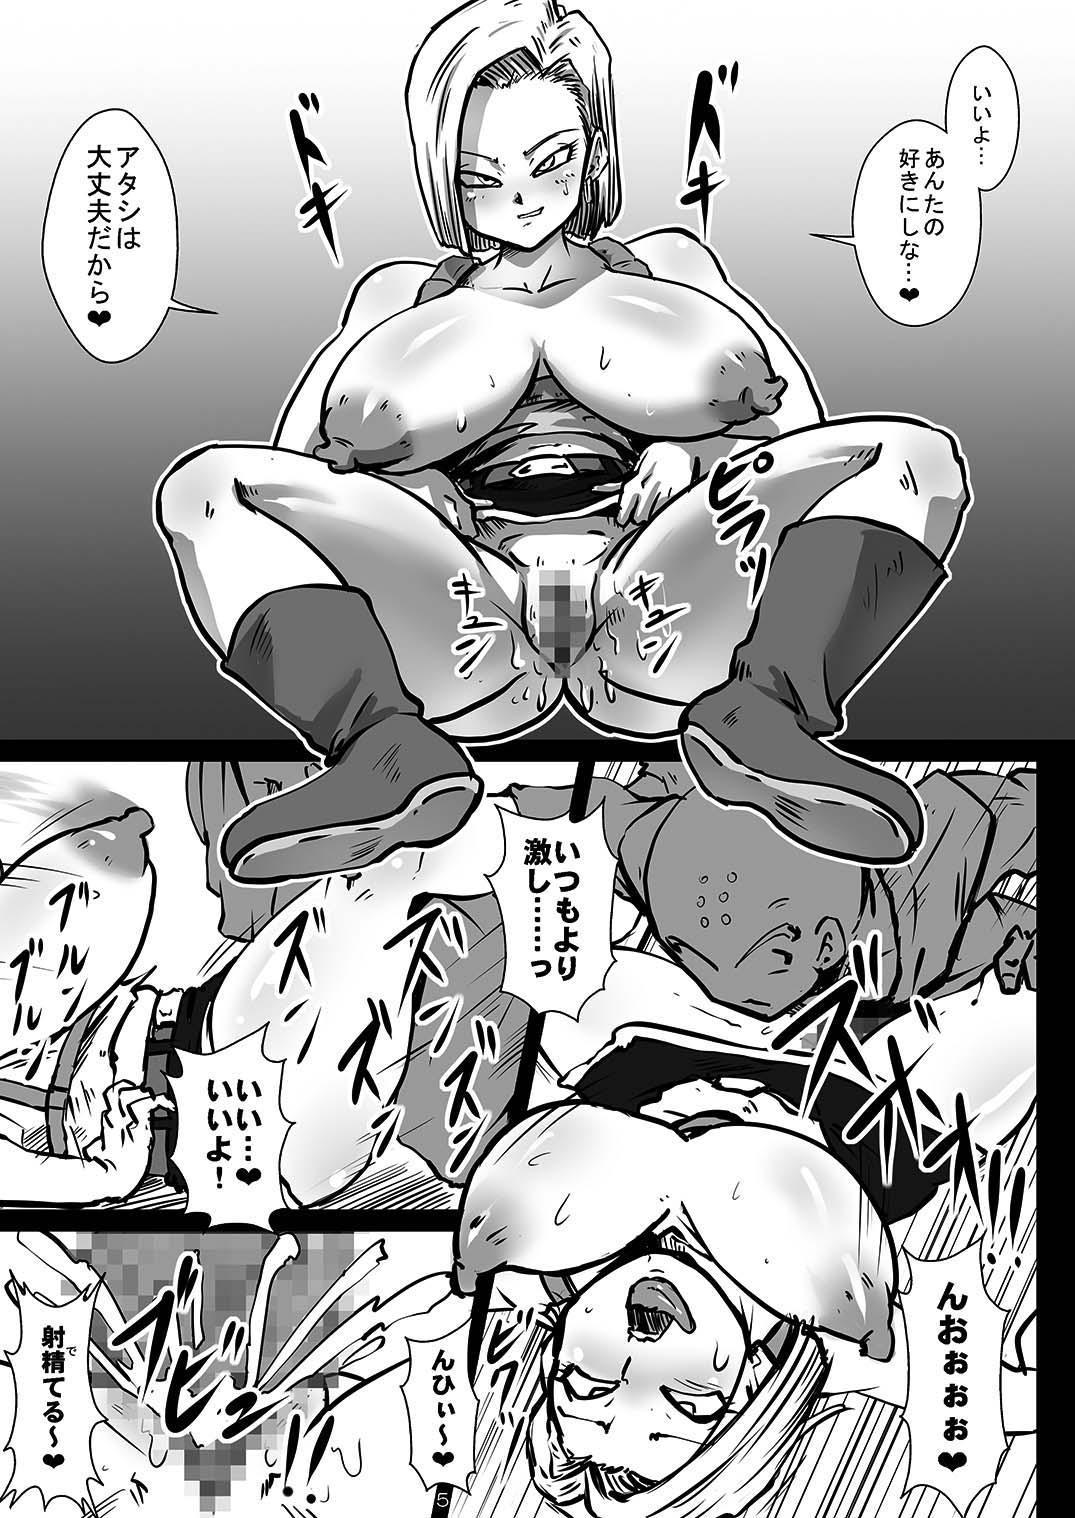 Tensei Shitara Raccoon City Datta Ken 4